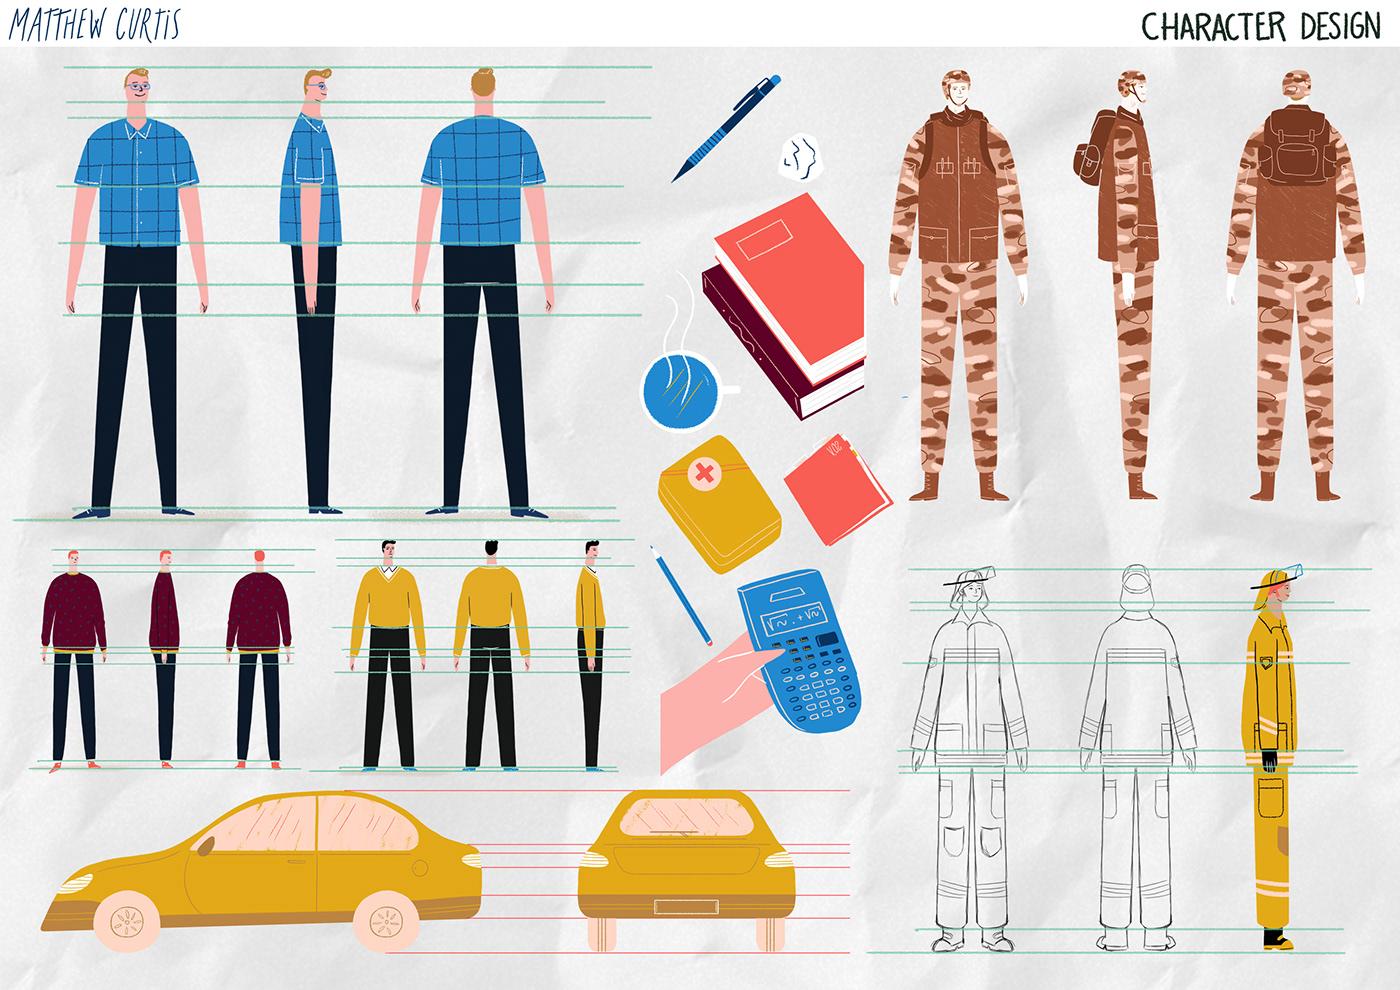 animation  Cel Animation non profit texas Lead By Example motion graphics  explanatory short film guille comin Elda Broglo